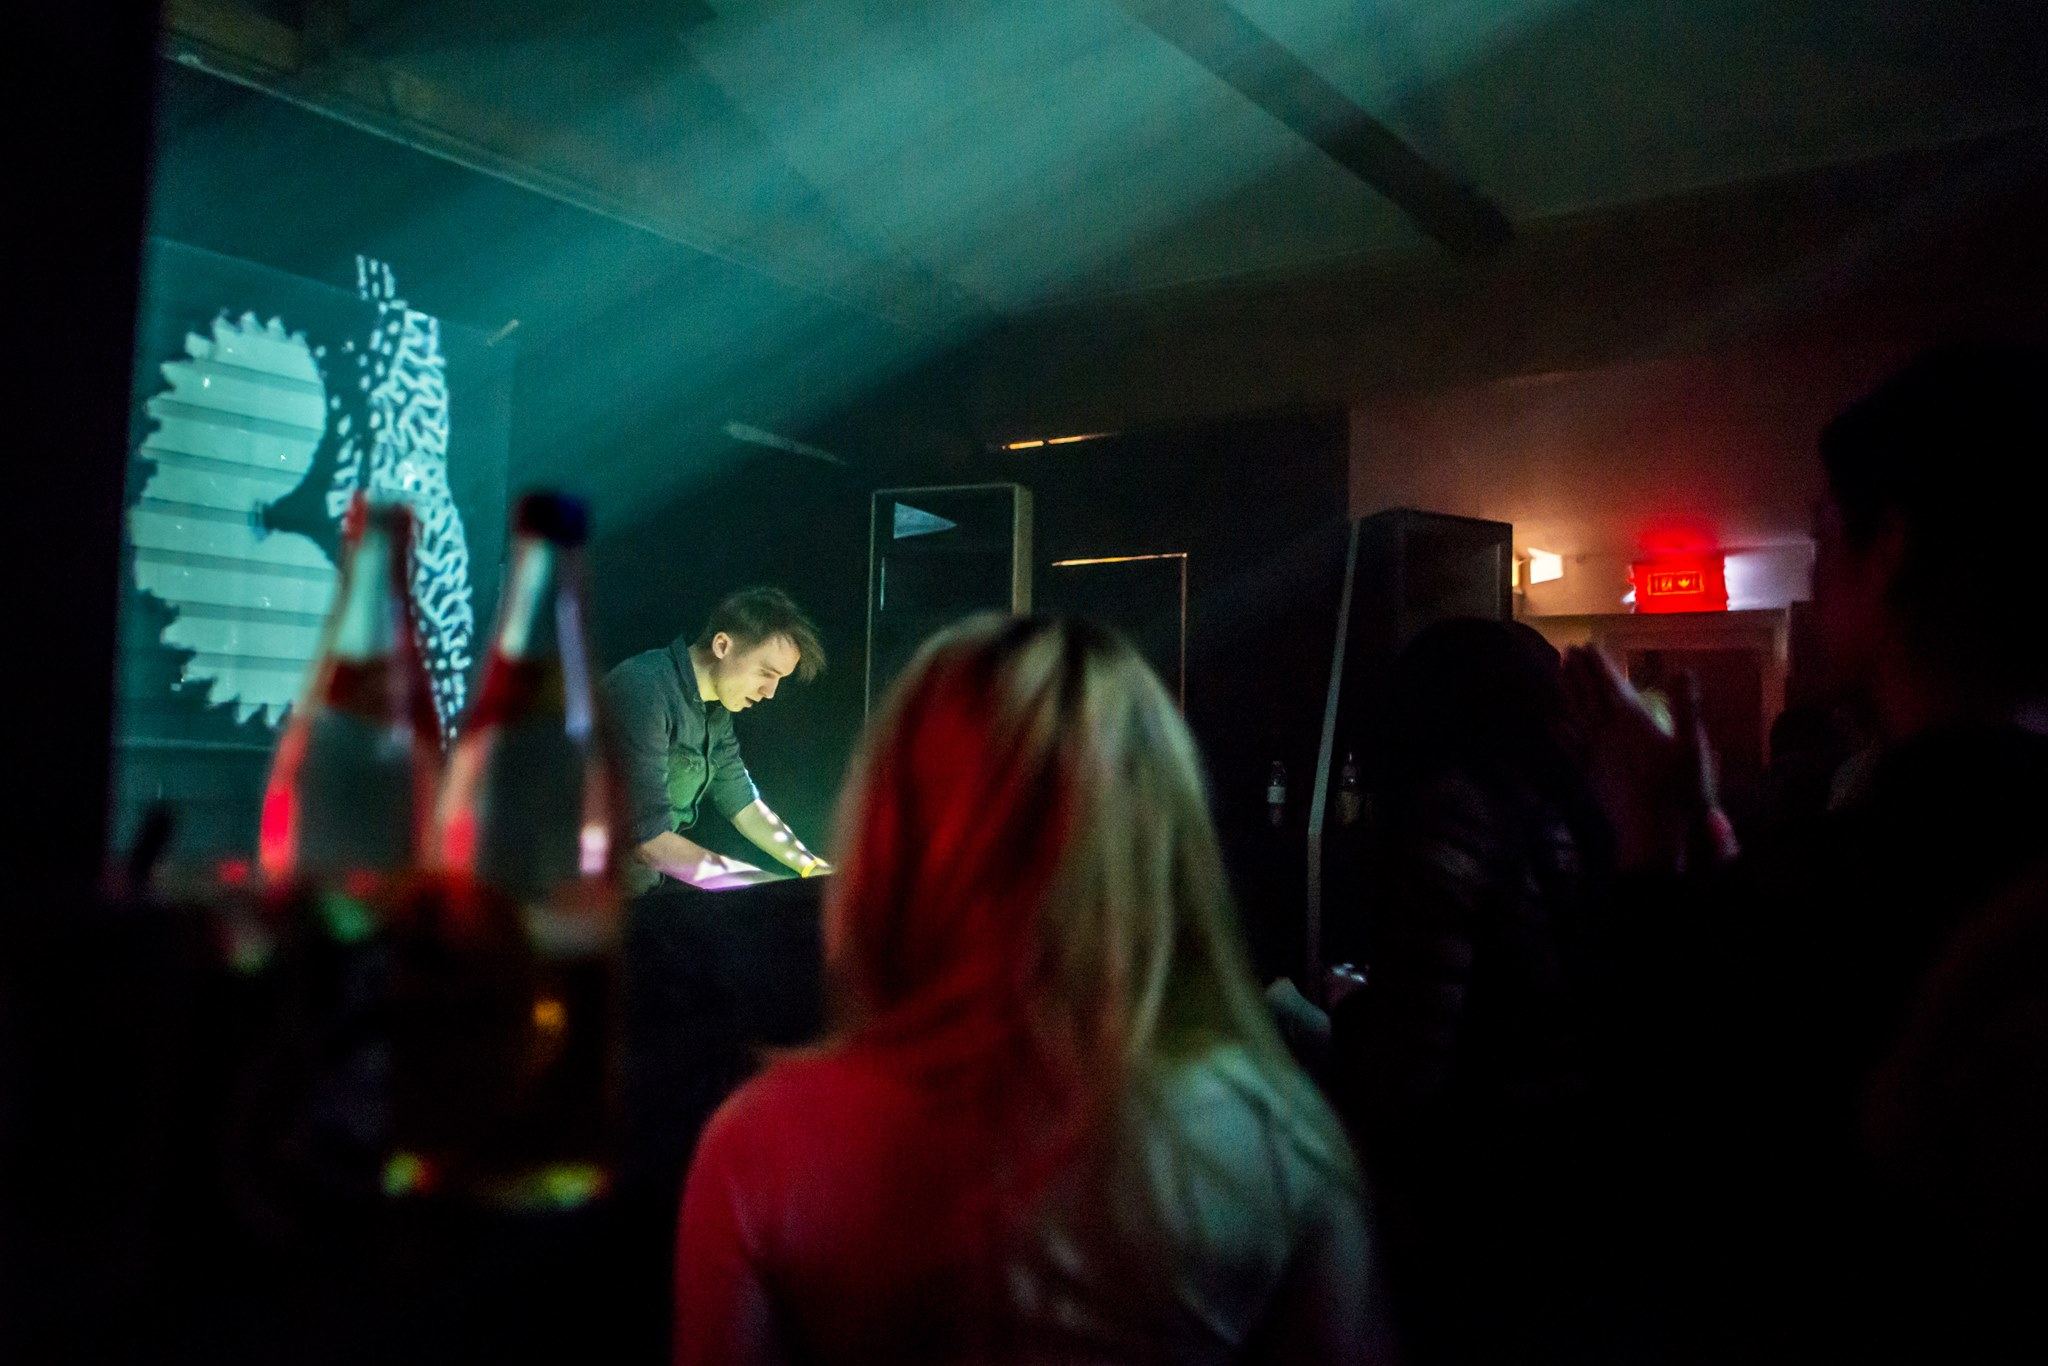 Blazej Malinowski x Sofus Forsberg - 02/03/2018